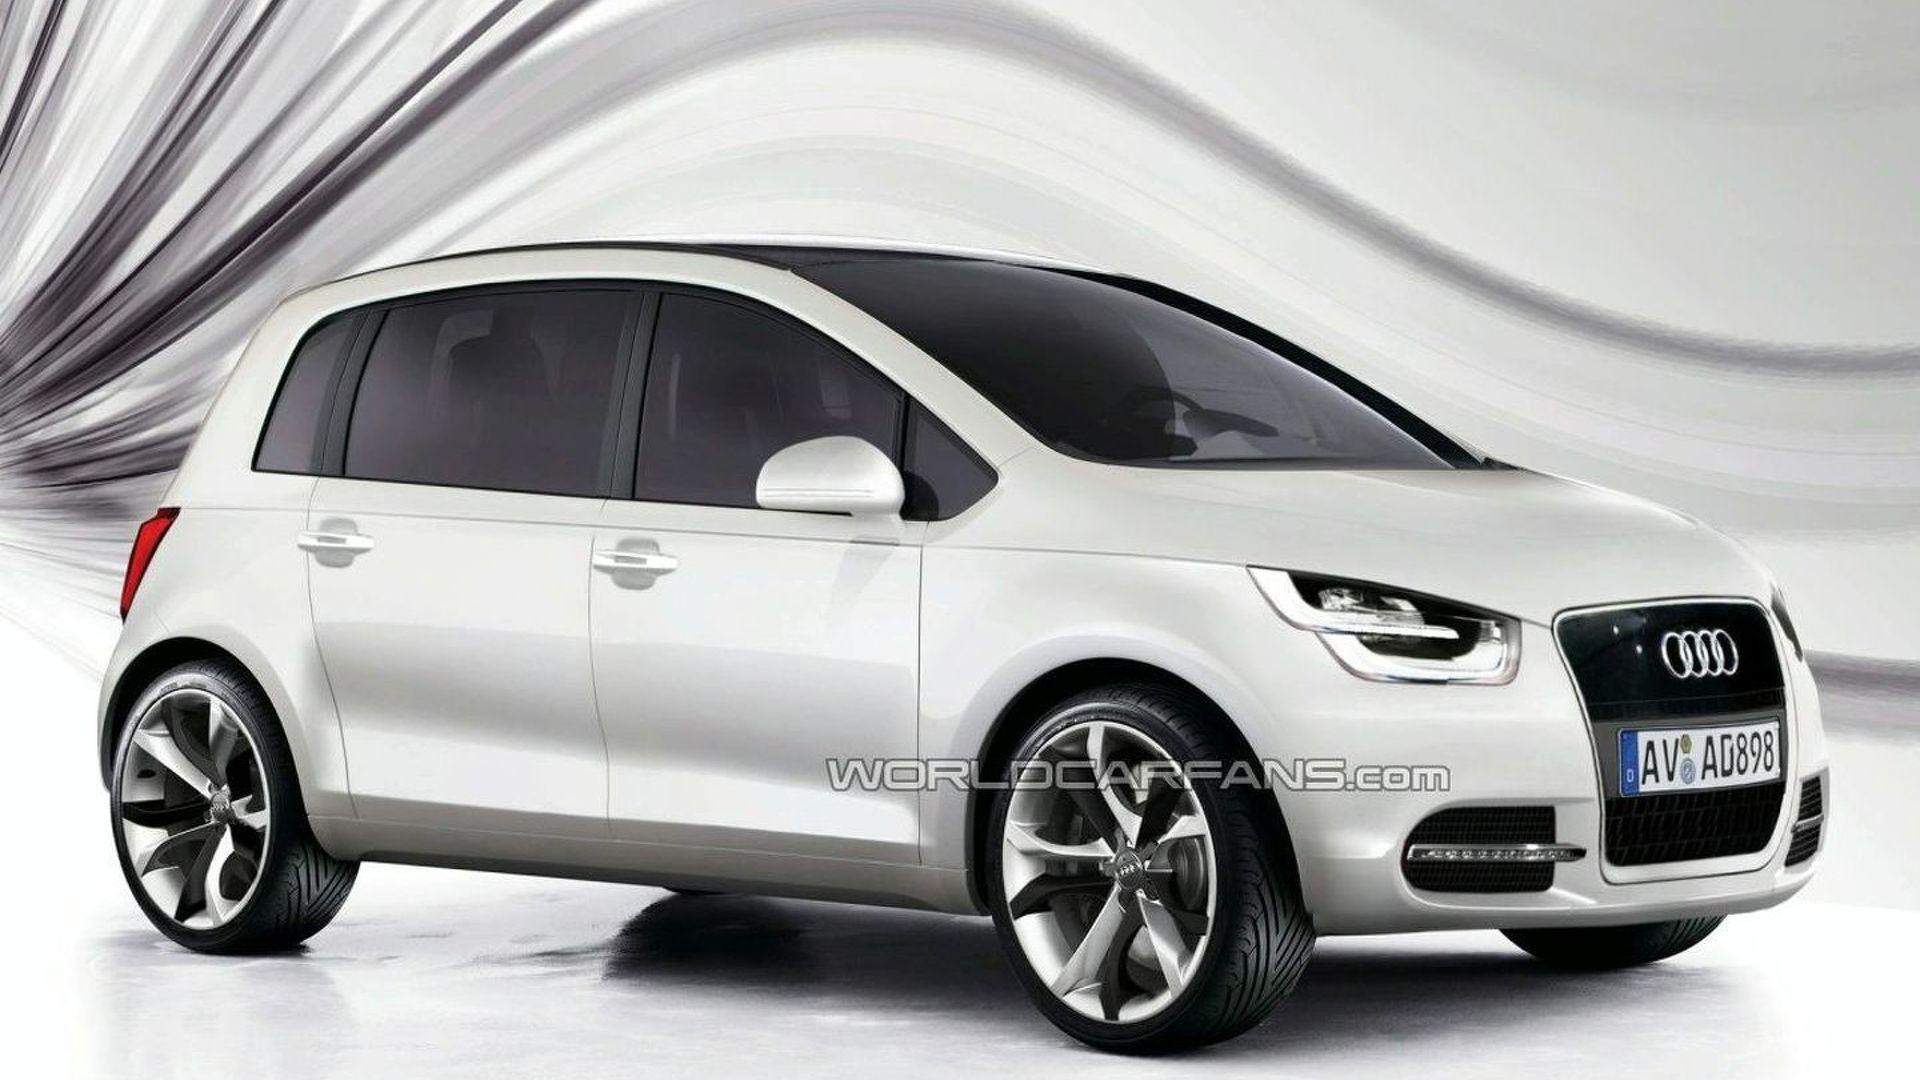 New Audi A2 Development Reaches Concept Car Stage